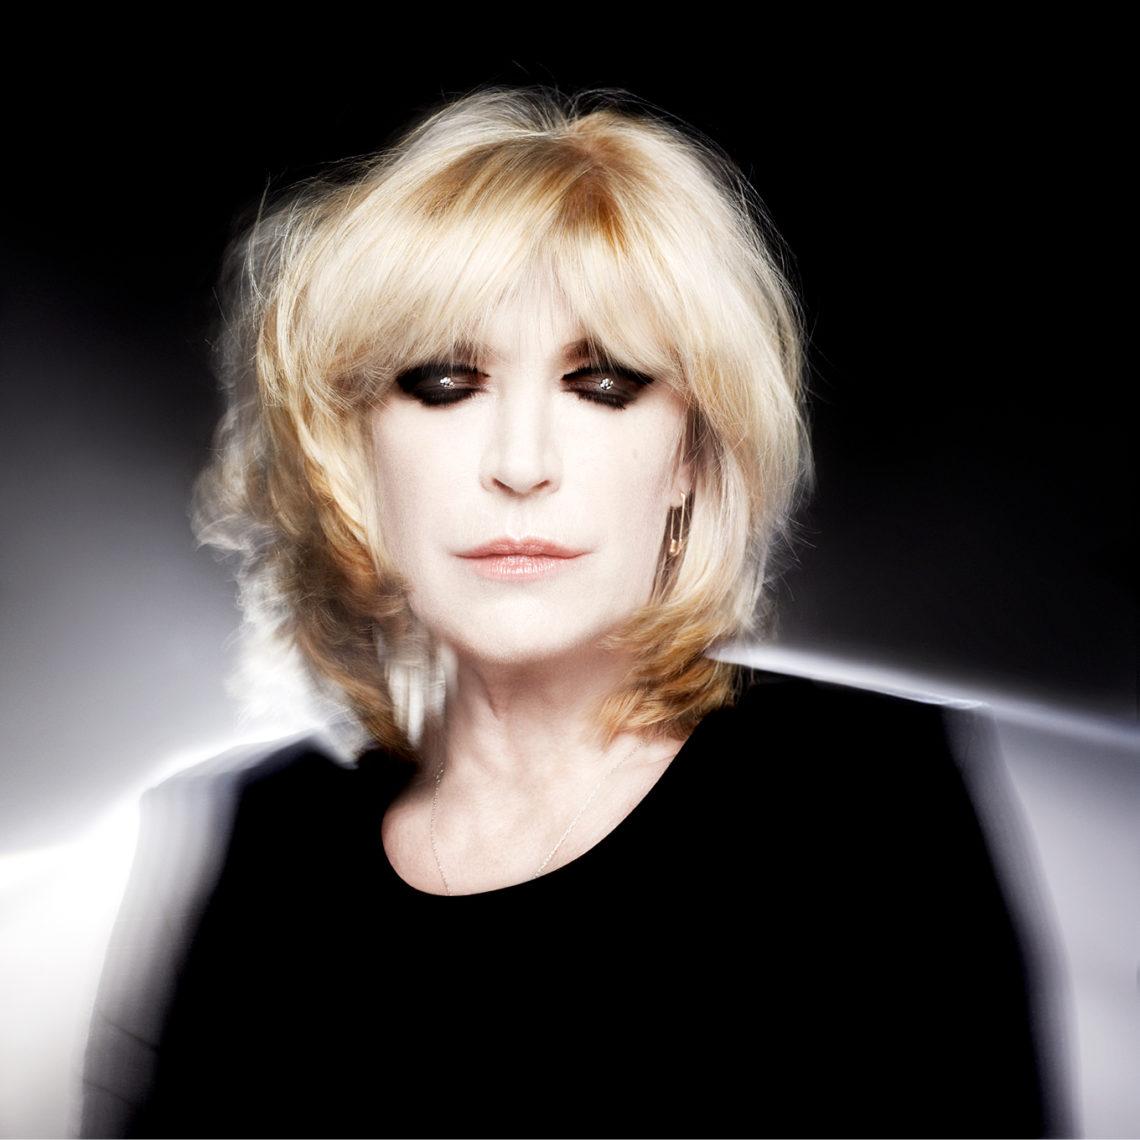 Portrait - Linda Bujoli